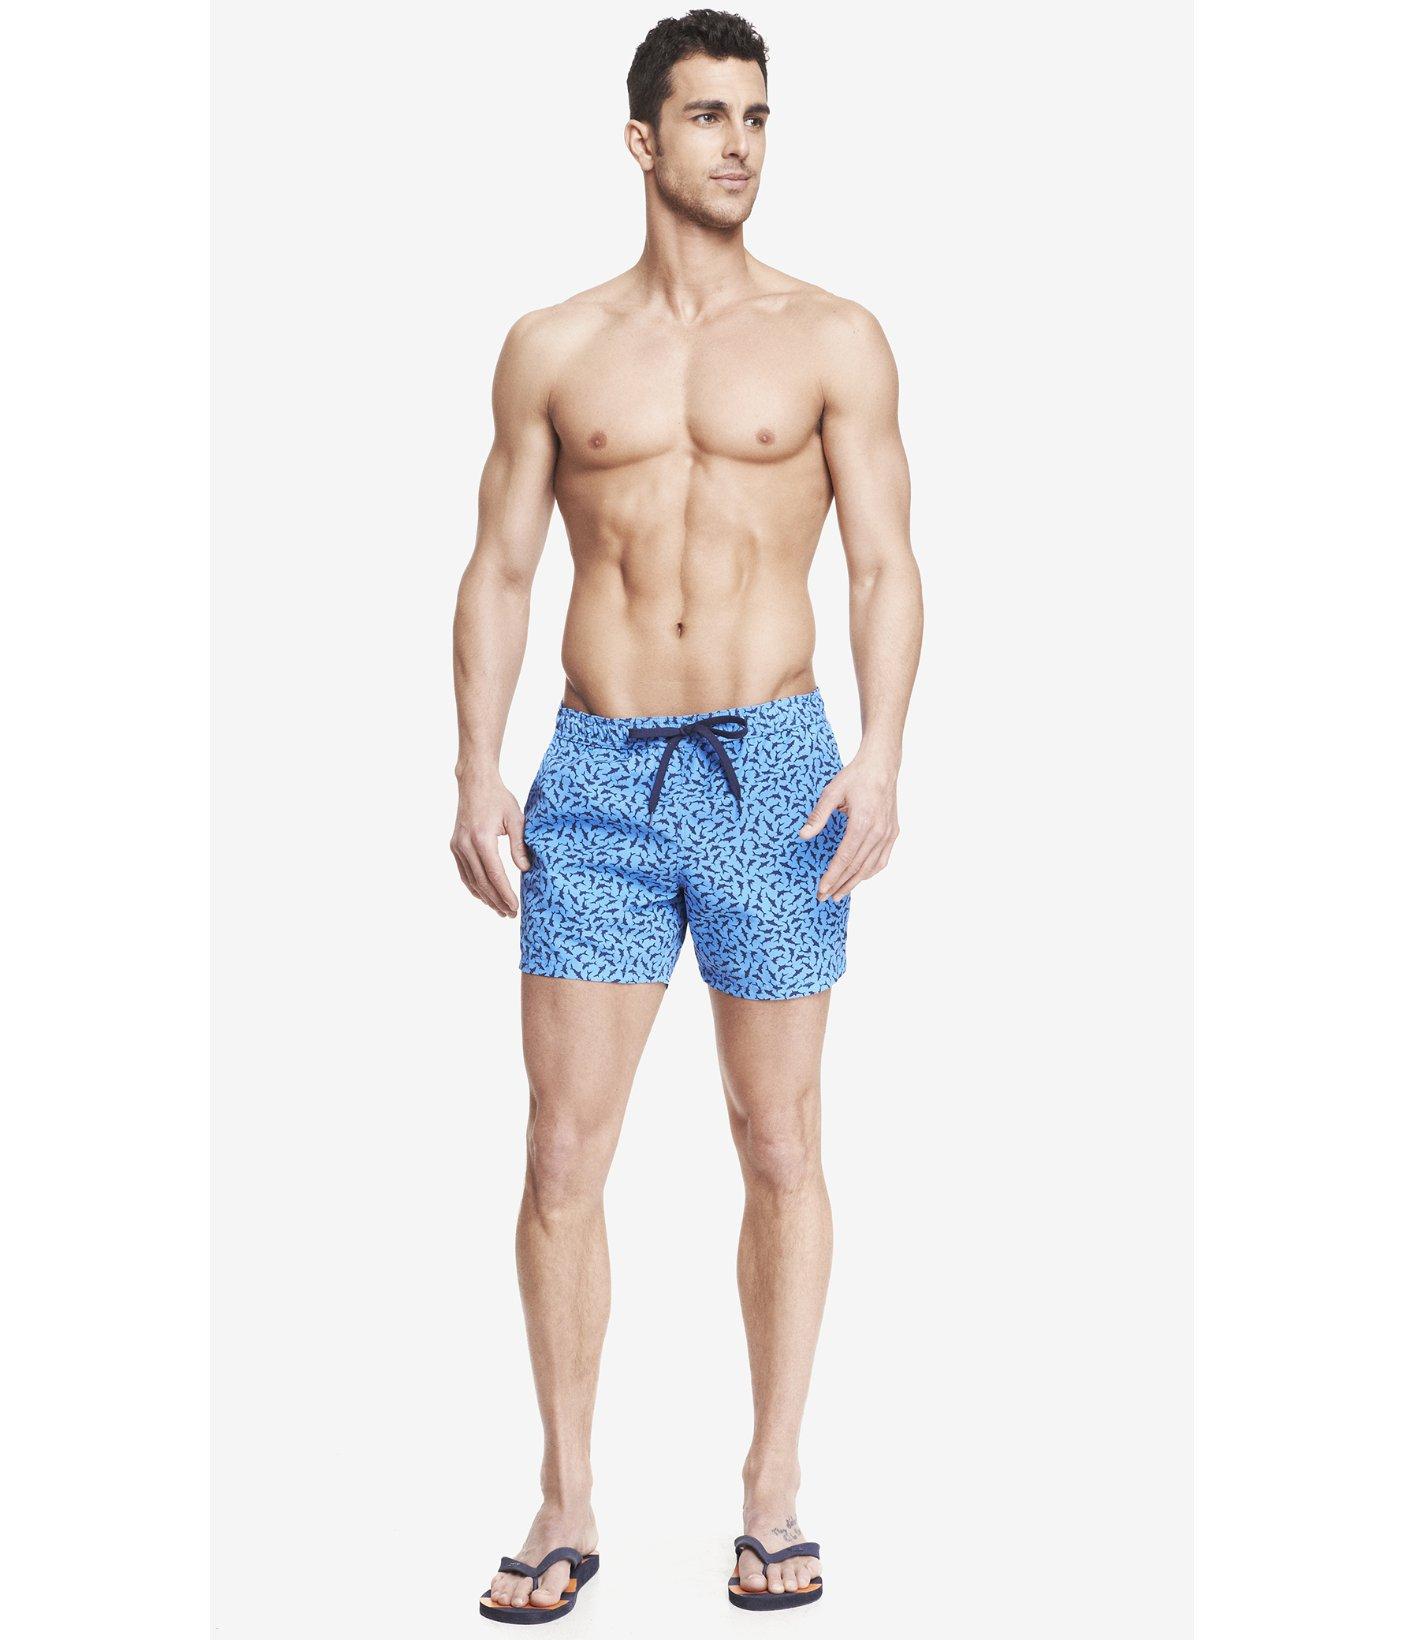 b079948051 Express Shark Print Swim Shorts in Blue for Men - Lyst